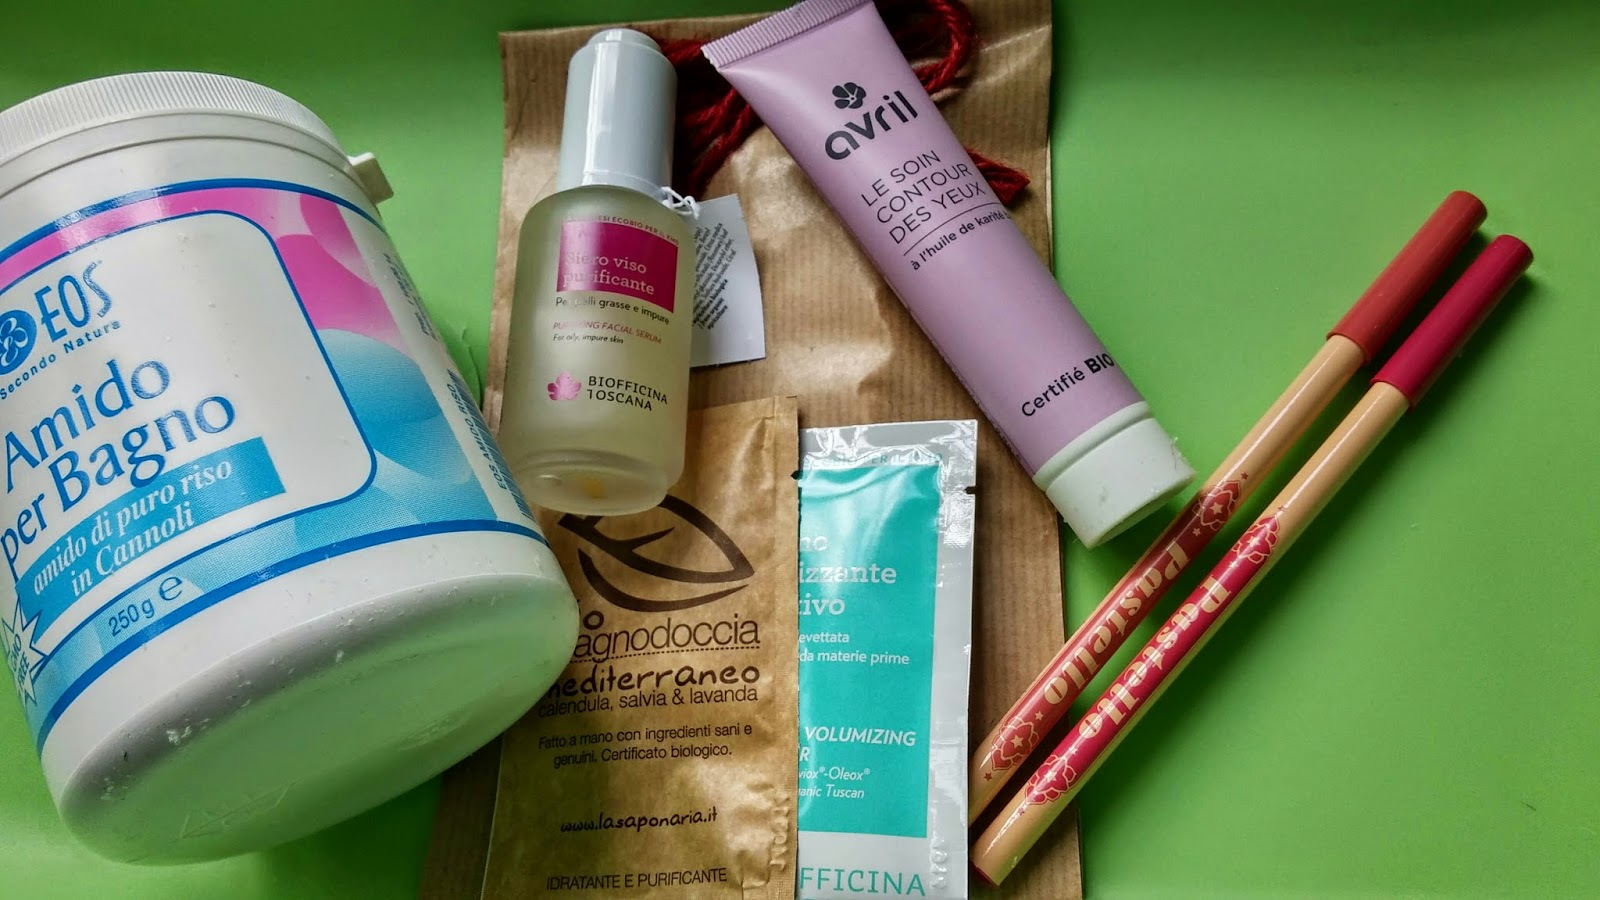 Neve Cosmetics, Avril, Biofficina Toscana, Eos, LaSaponaria